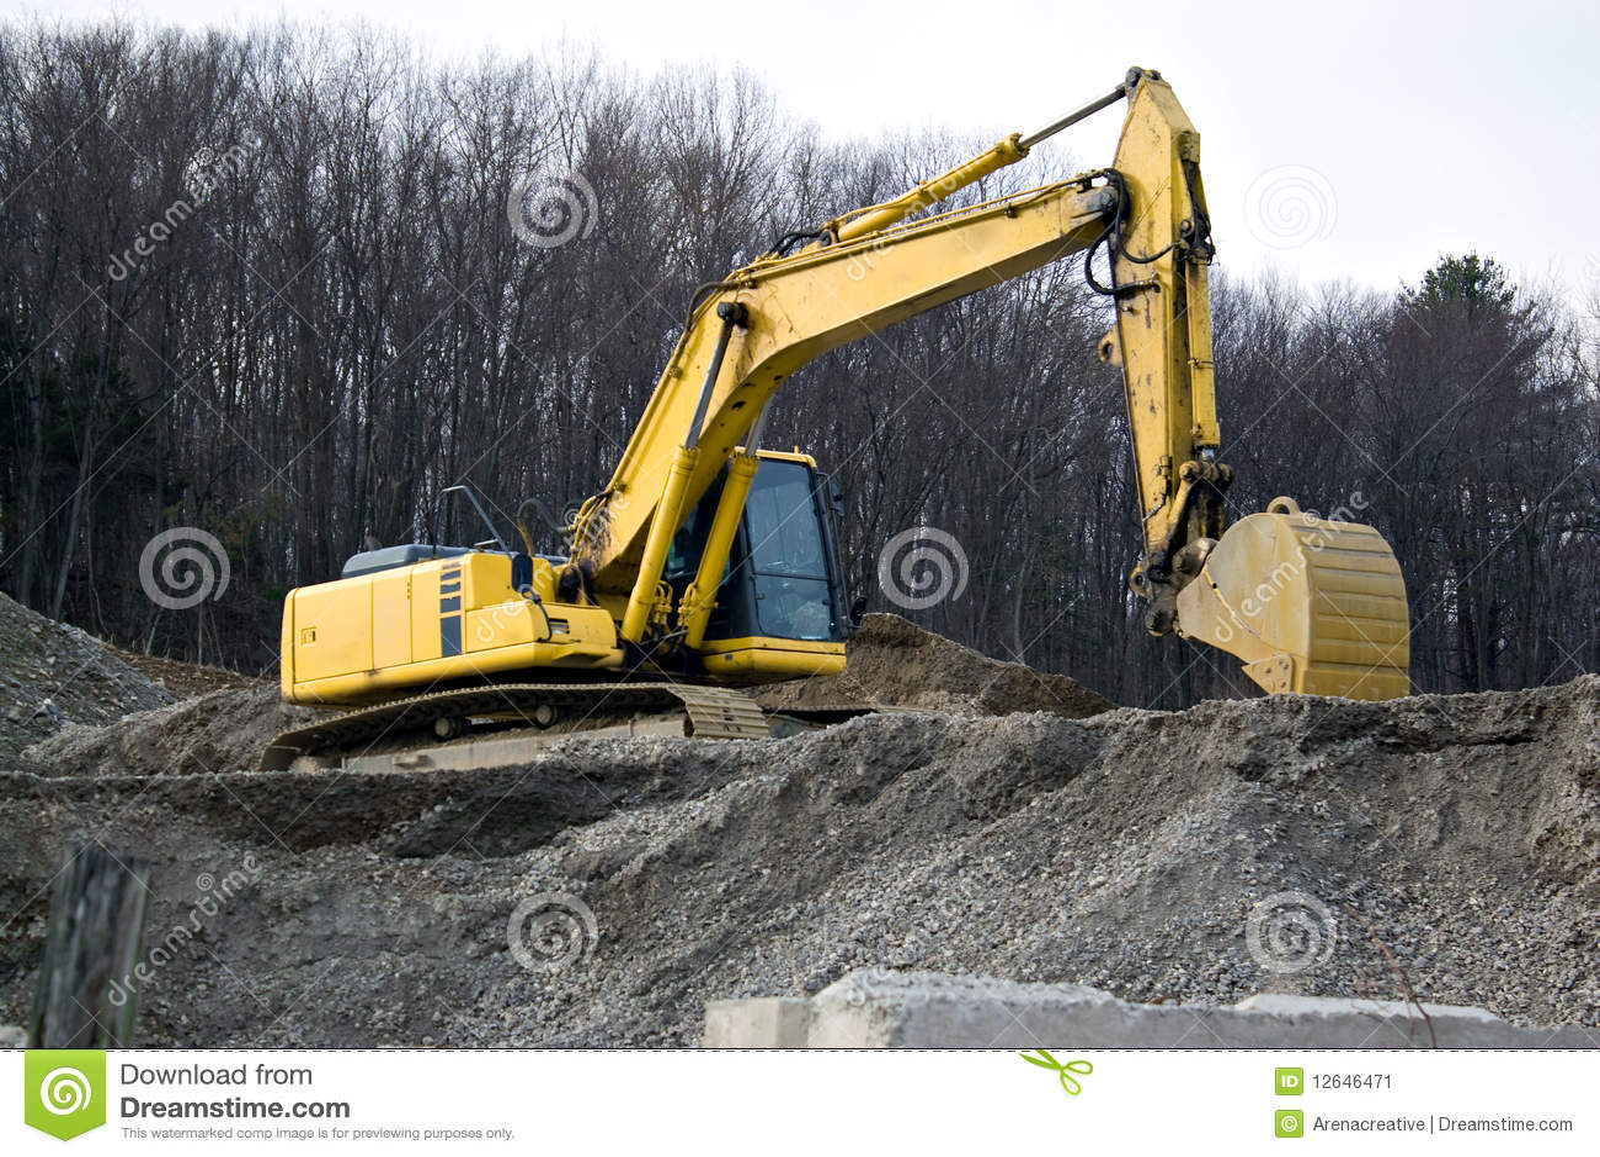 Heavy Duty Construction : Heavy duty construction stock image